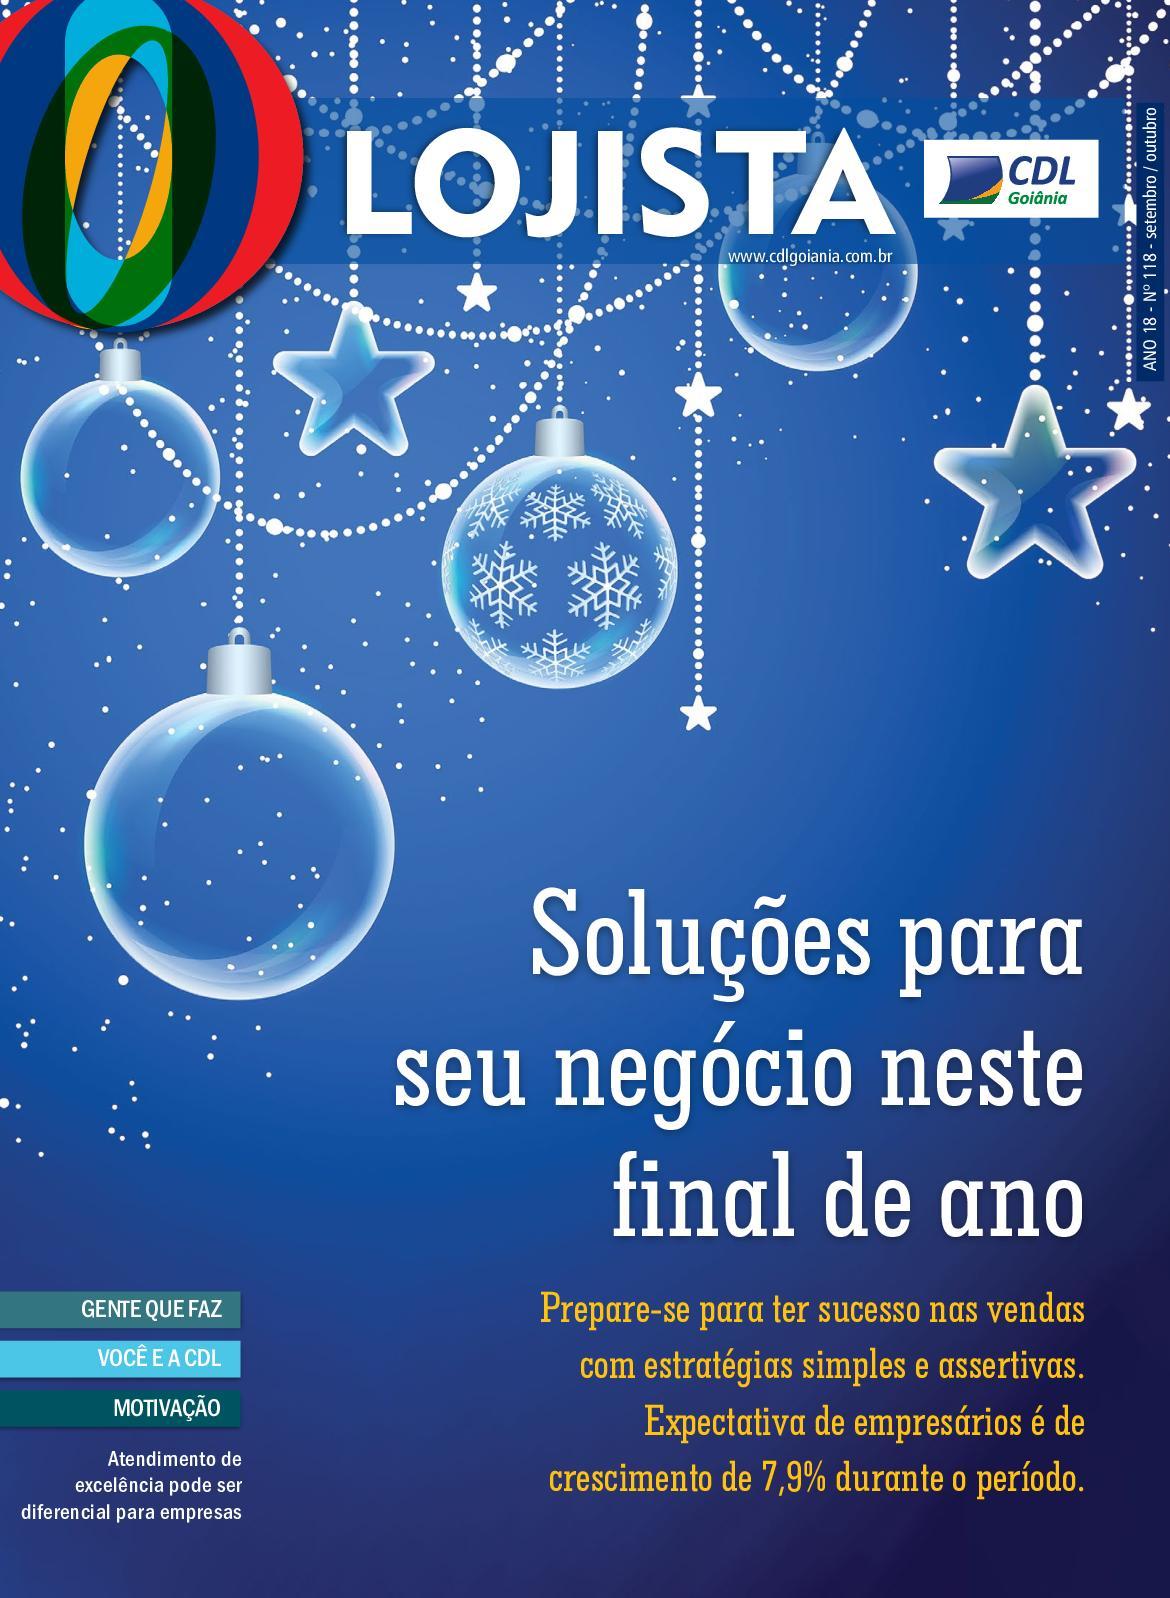 fbaa7db09 Calaméo - Revista O Lojista Ed 118